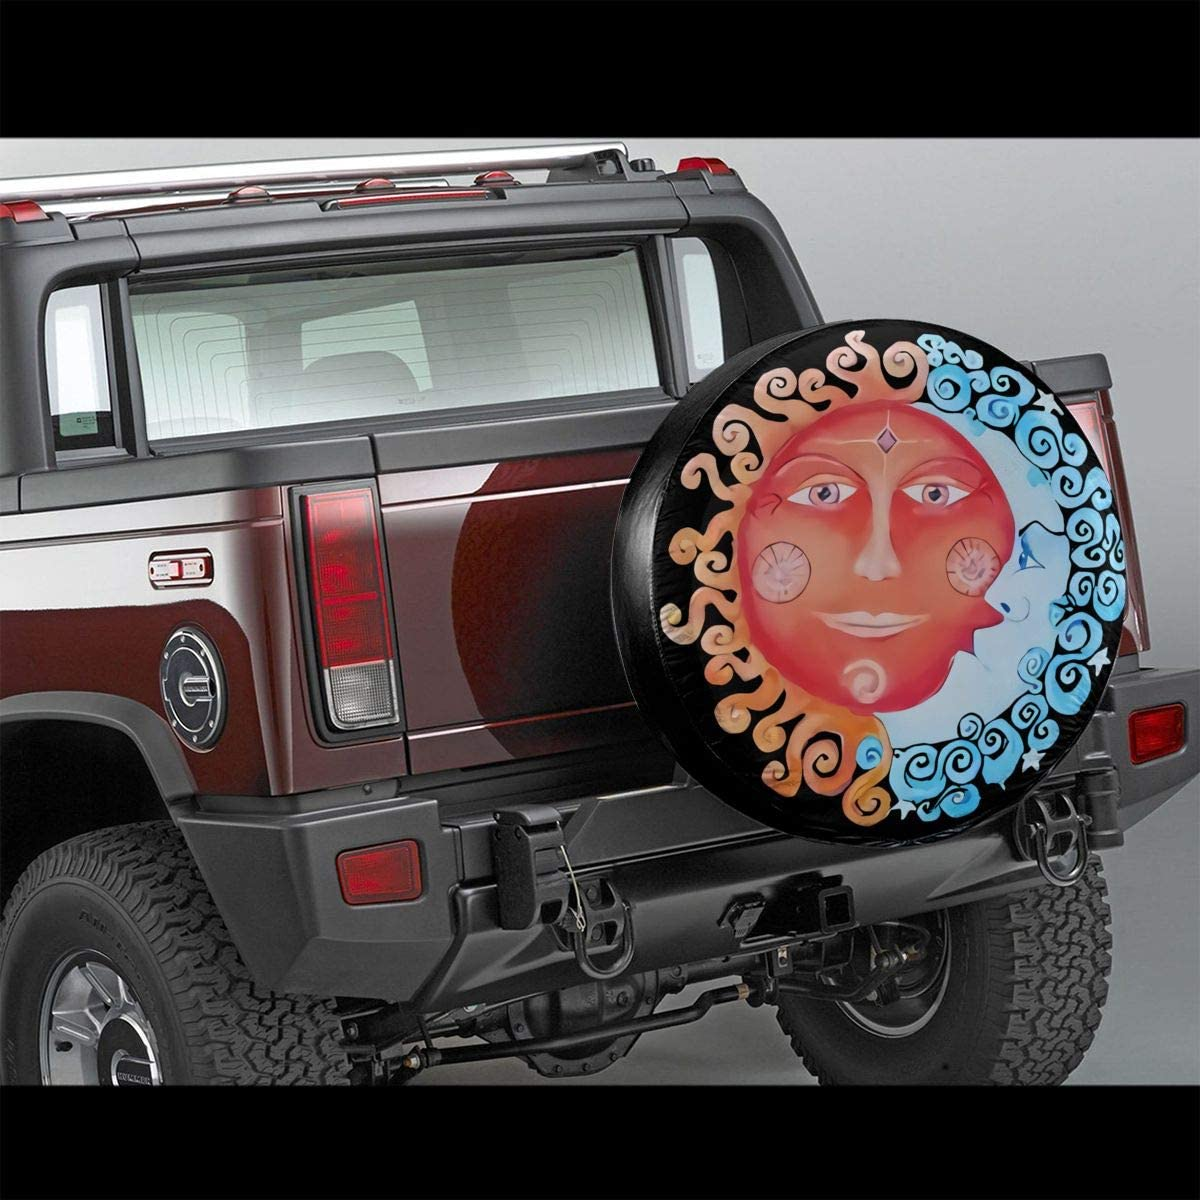 RV 14,15,16,17 Inch SHOE GONE Car Tire Cover Sun Moon Spare Wheel Tire Cover for Jeep,Trailer Truck Wheel,Camper Travel Trailer Accessories SUV